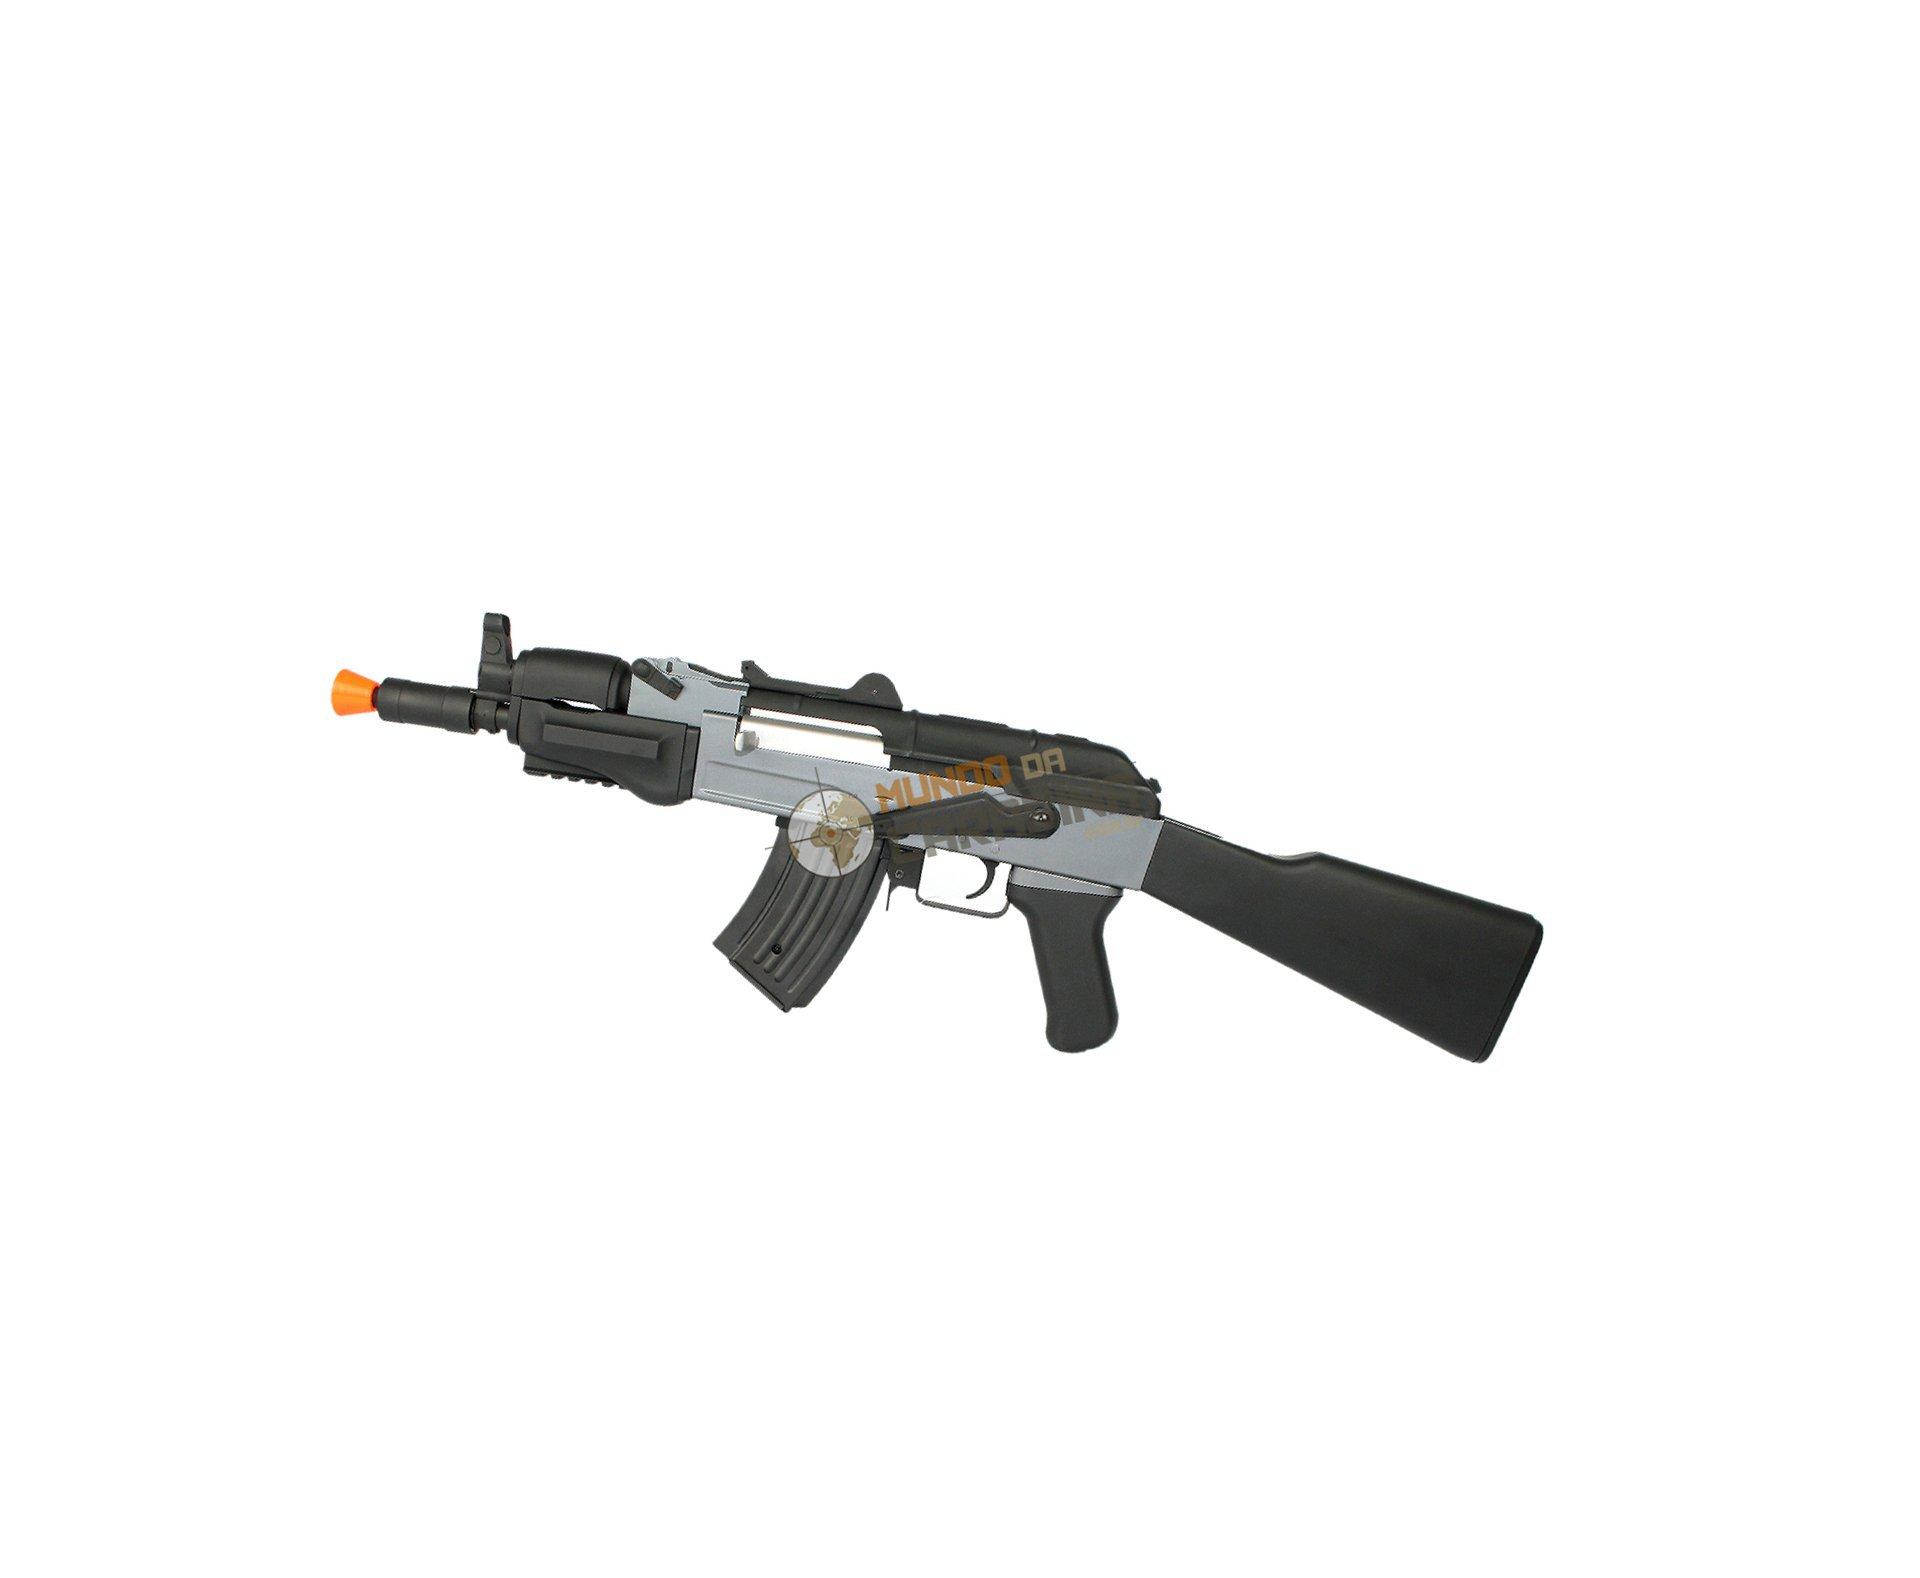 Rifle De Airsoft Ak Spetsnaz - Cal 6.0mm + 4000 Esferas 0,20g + Capa - Cyma